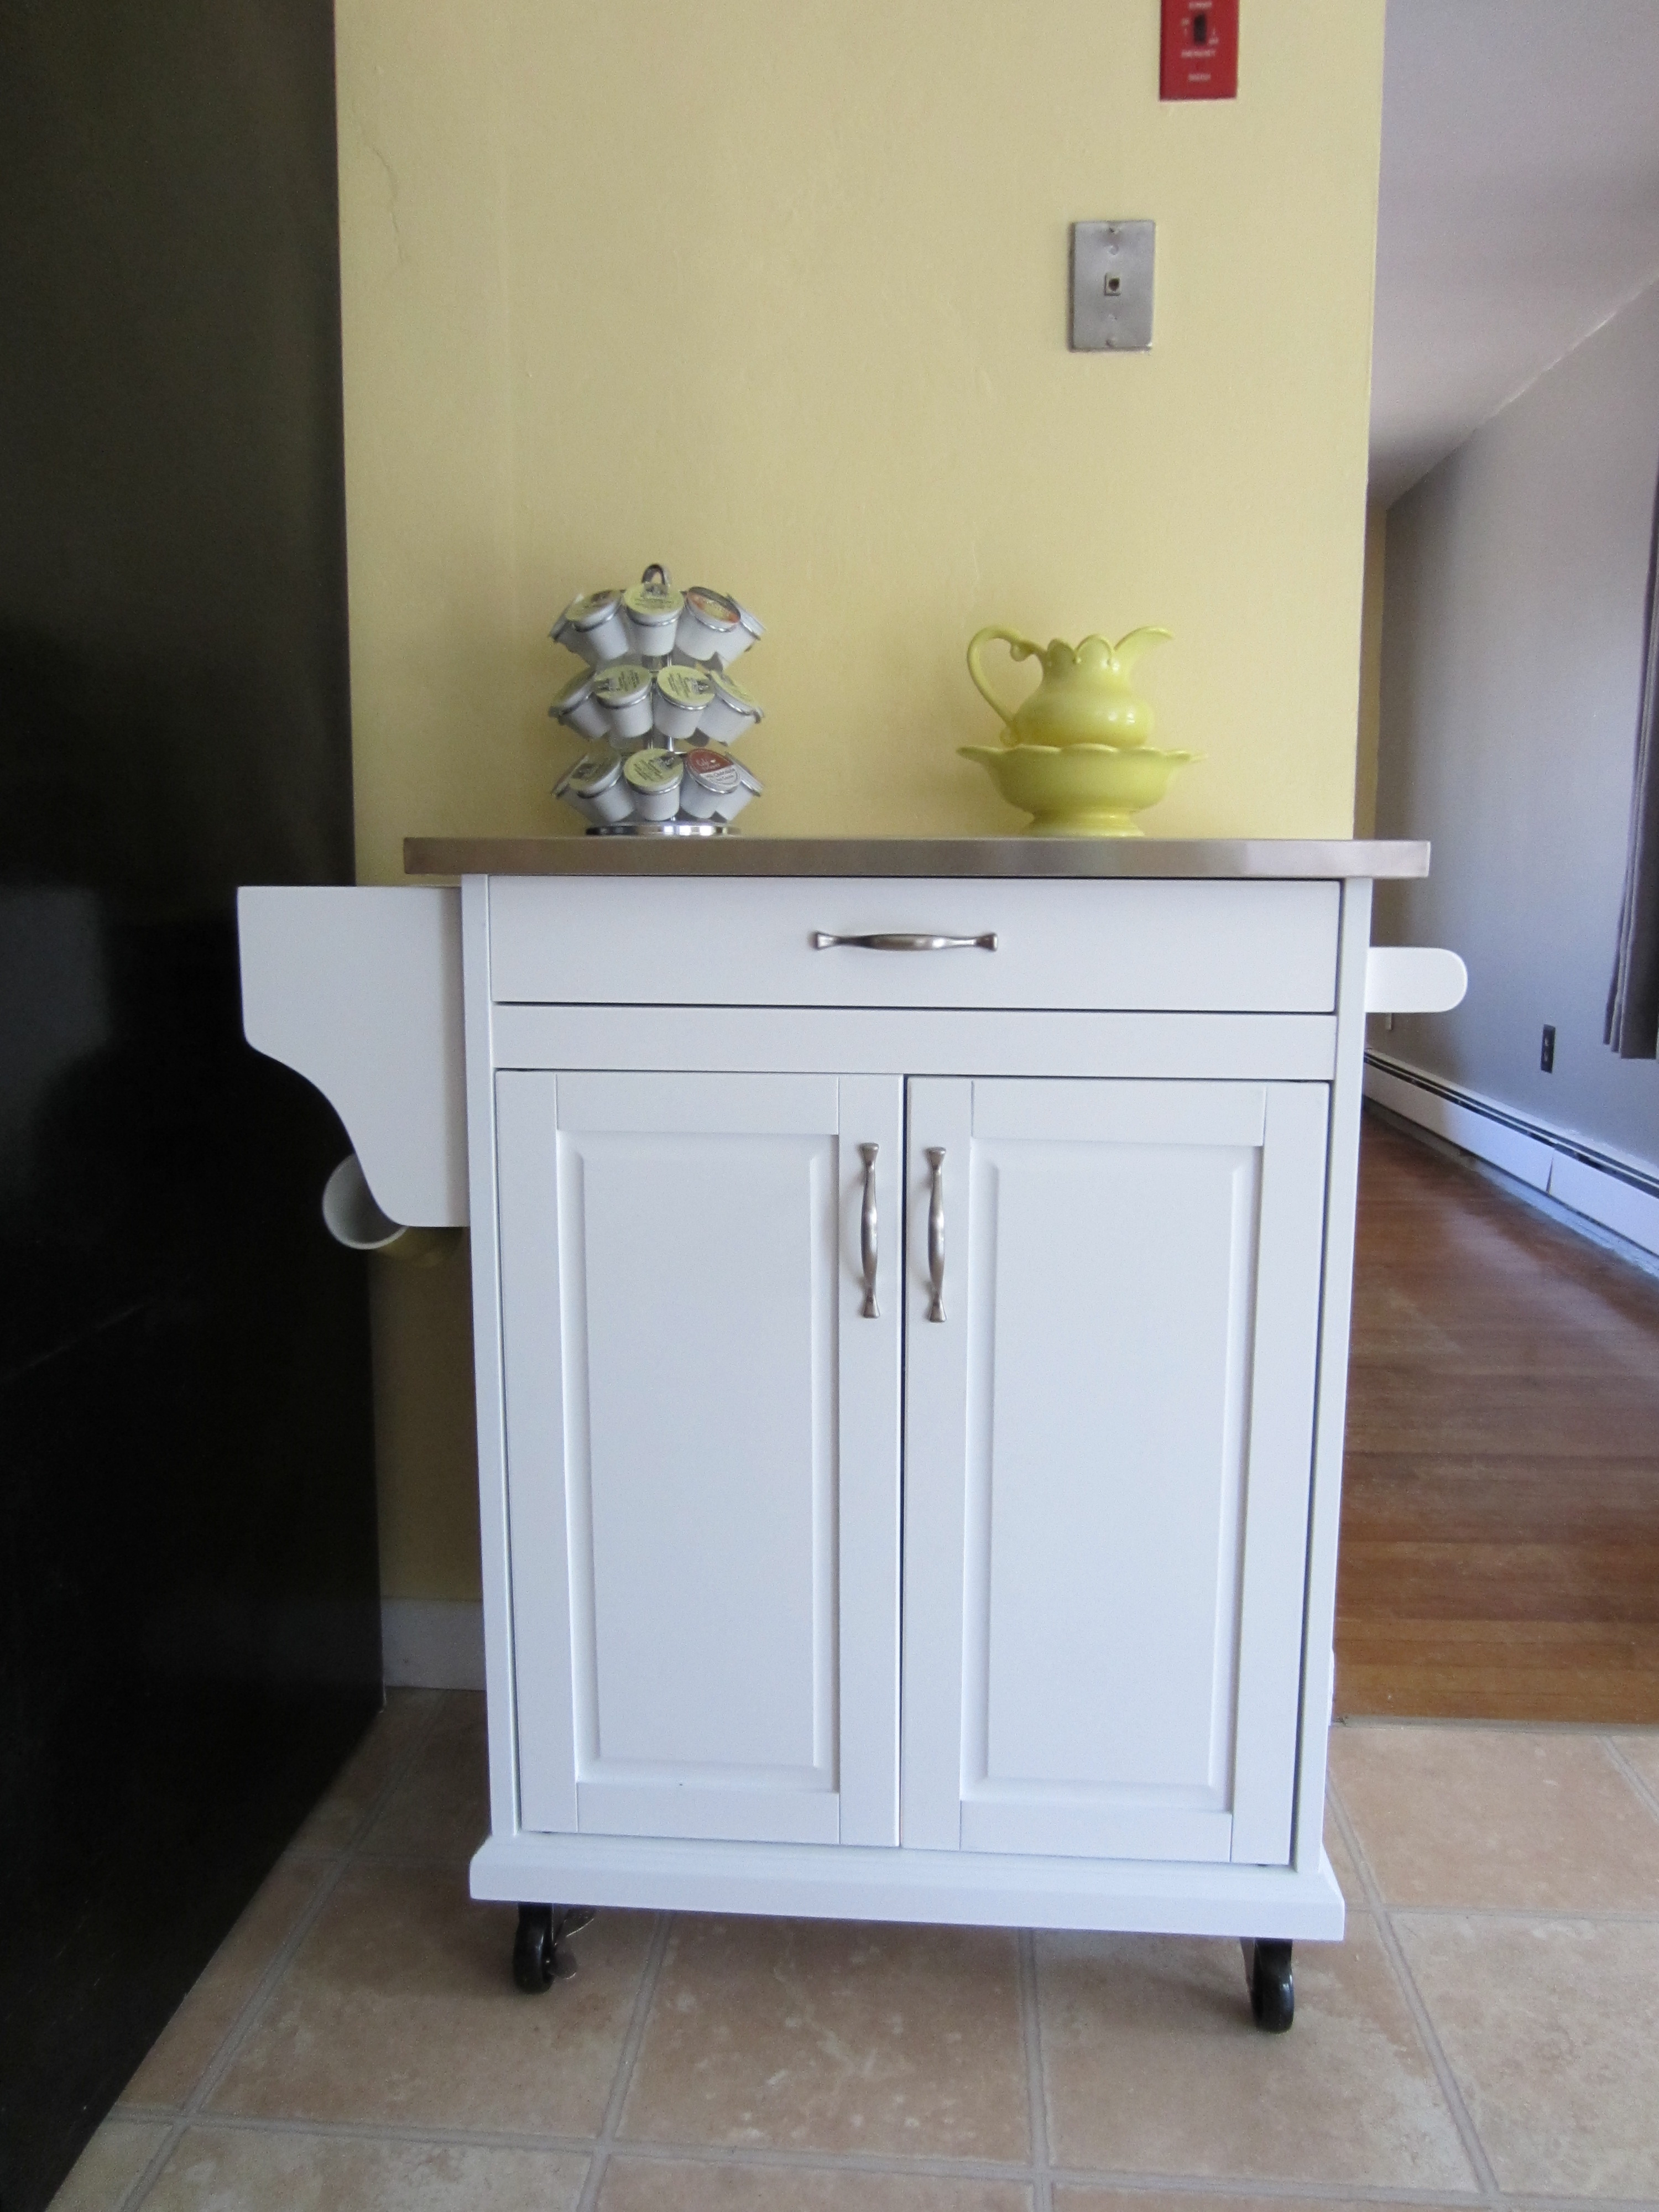 Big Lots Kitchen Cabinets Kitchen island cart big lots | | Kitchen ideas